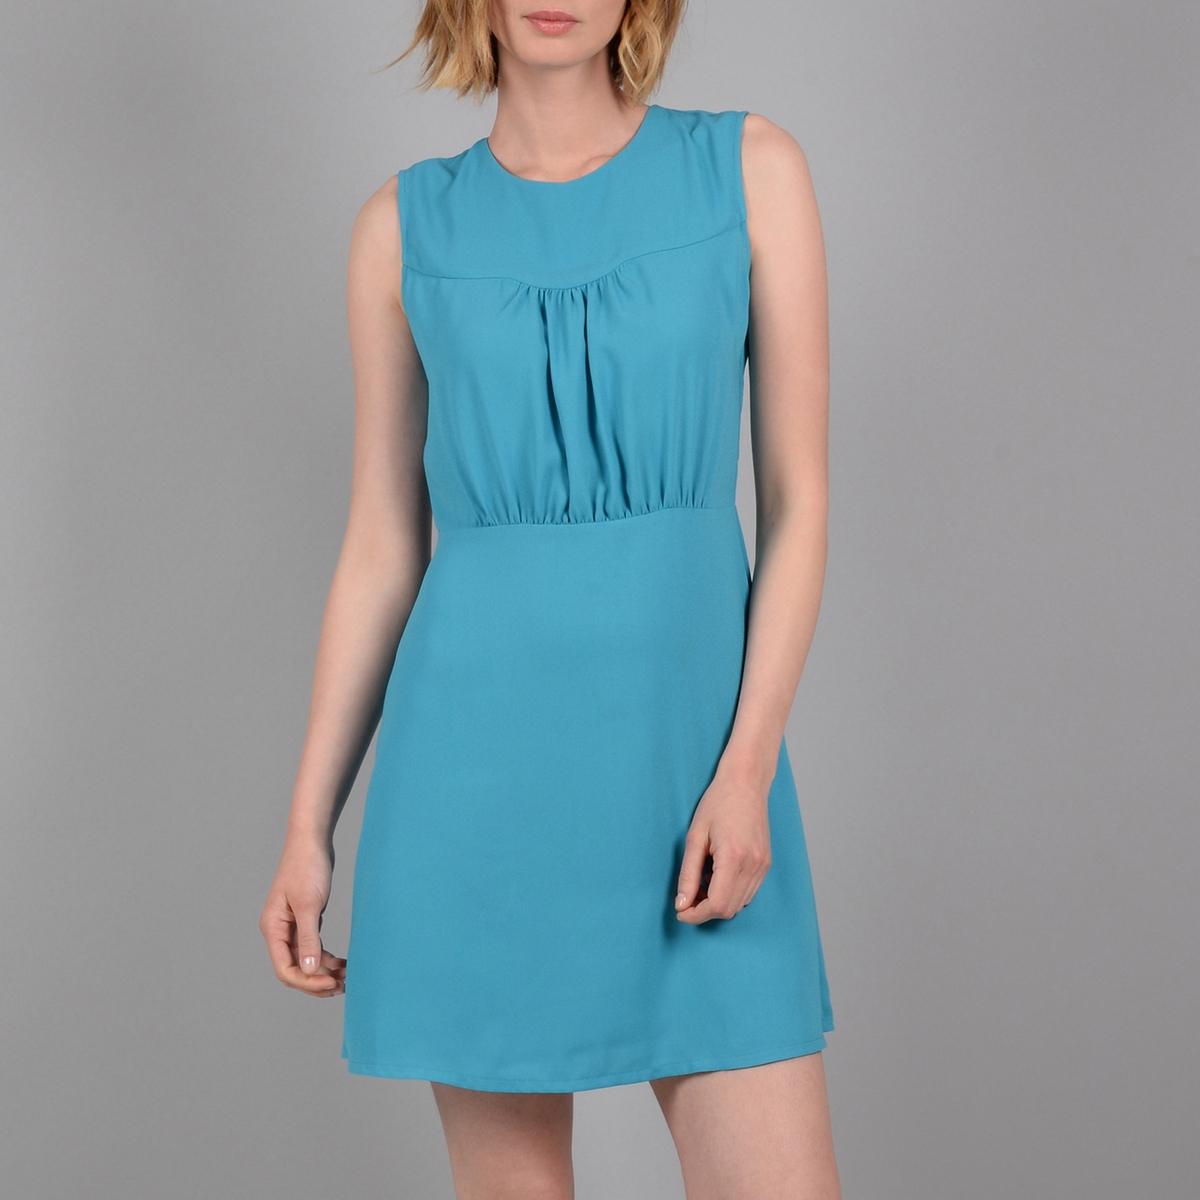 Платье La Redoute Короткое без рукавов со вставкой на груди L синий